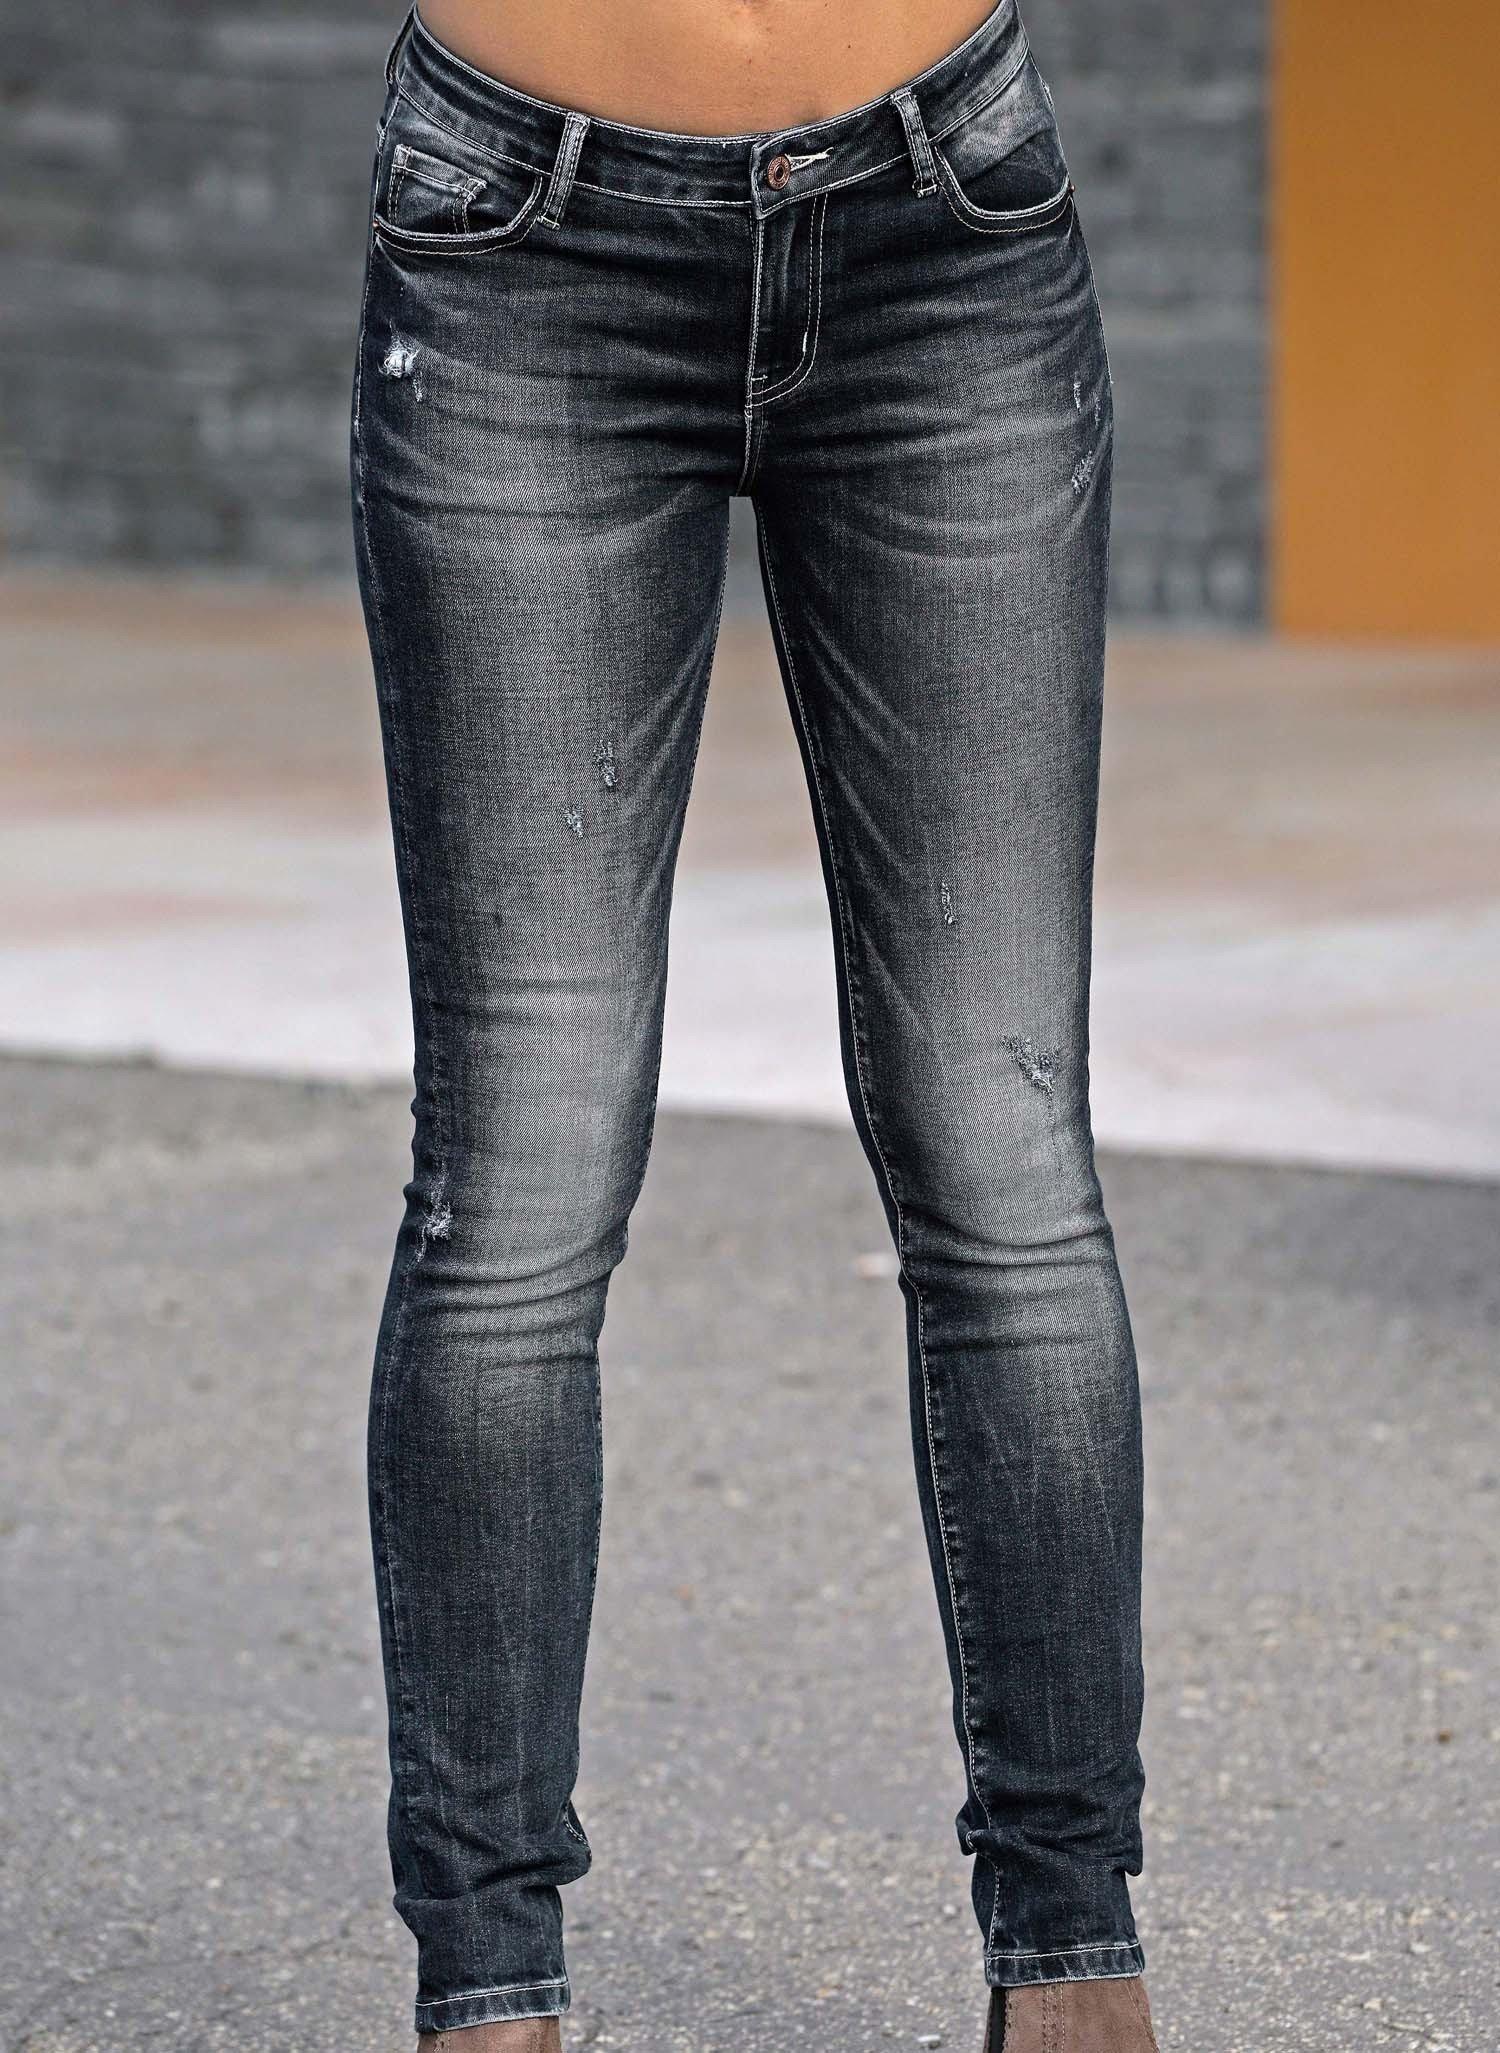 D-5-Poket Jeans, Black-Denim 44 012 - 2 - Ronja.ch